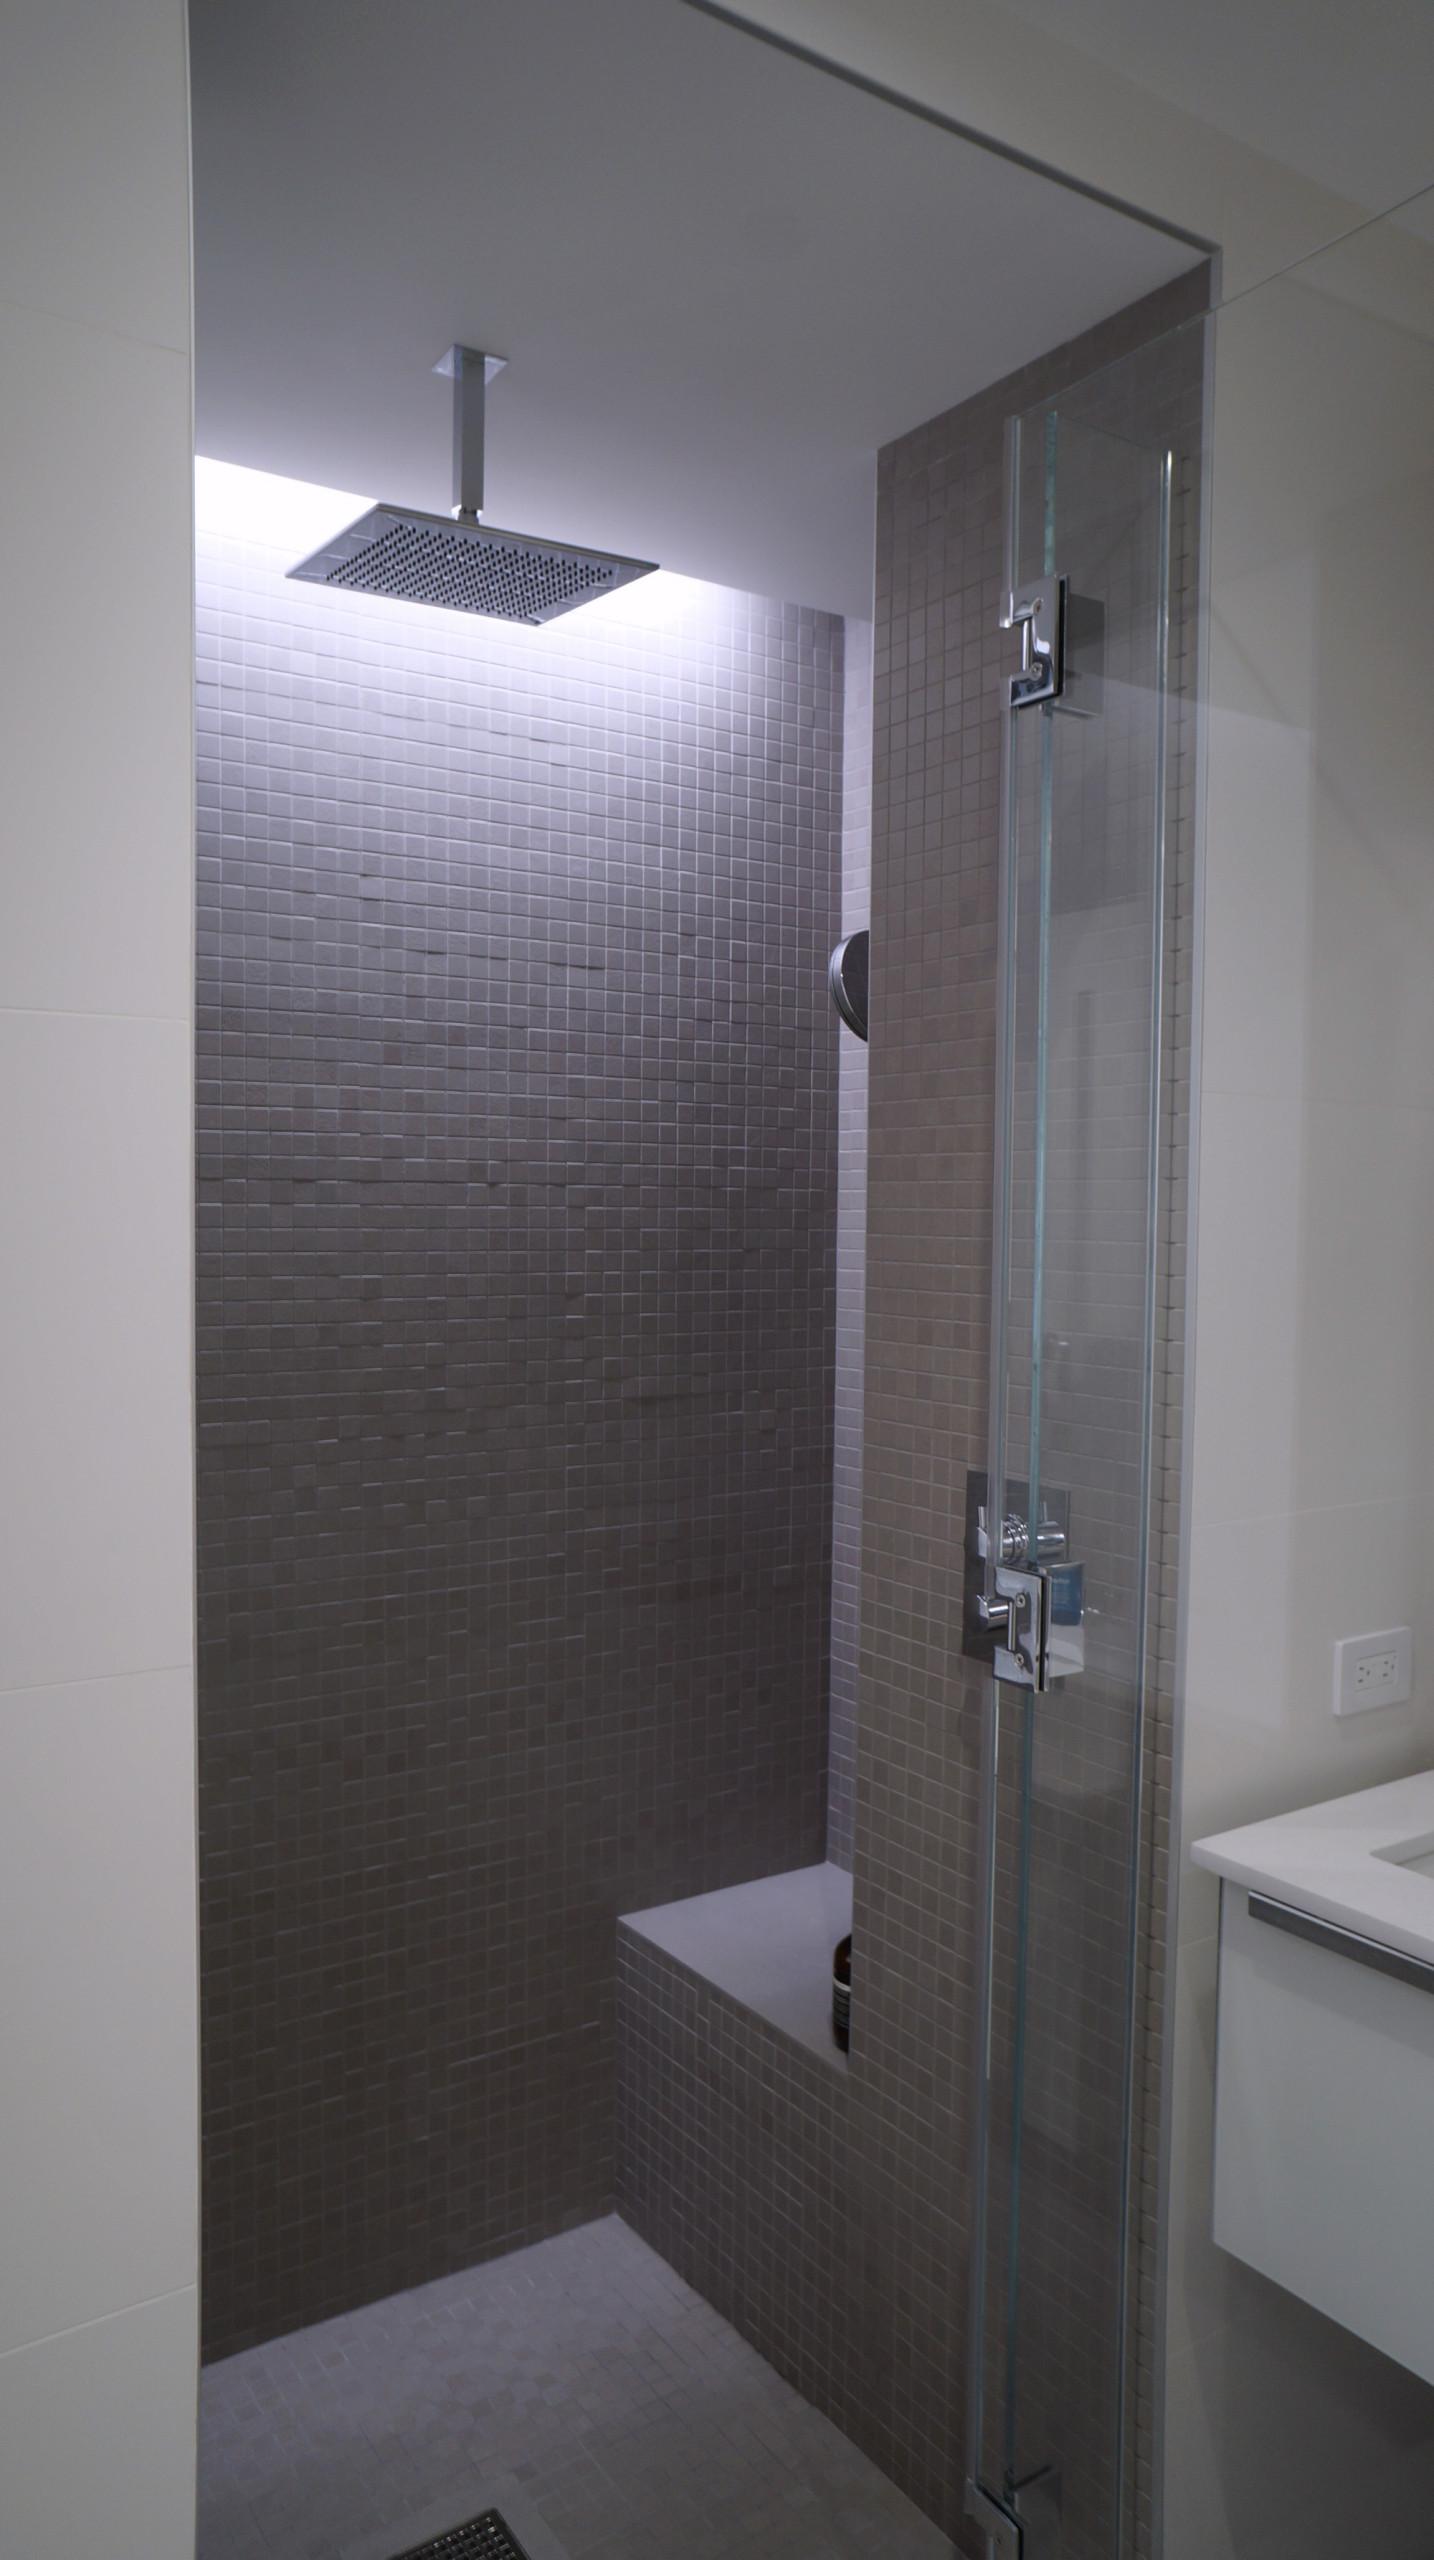 DETAIL - Master Bathroom Shower